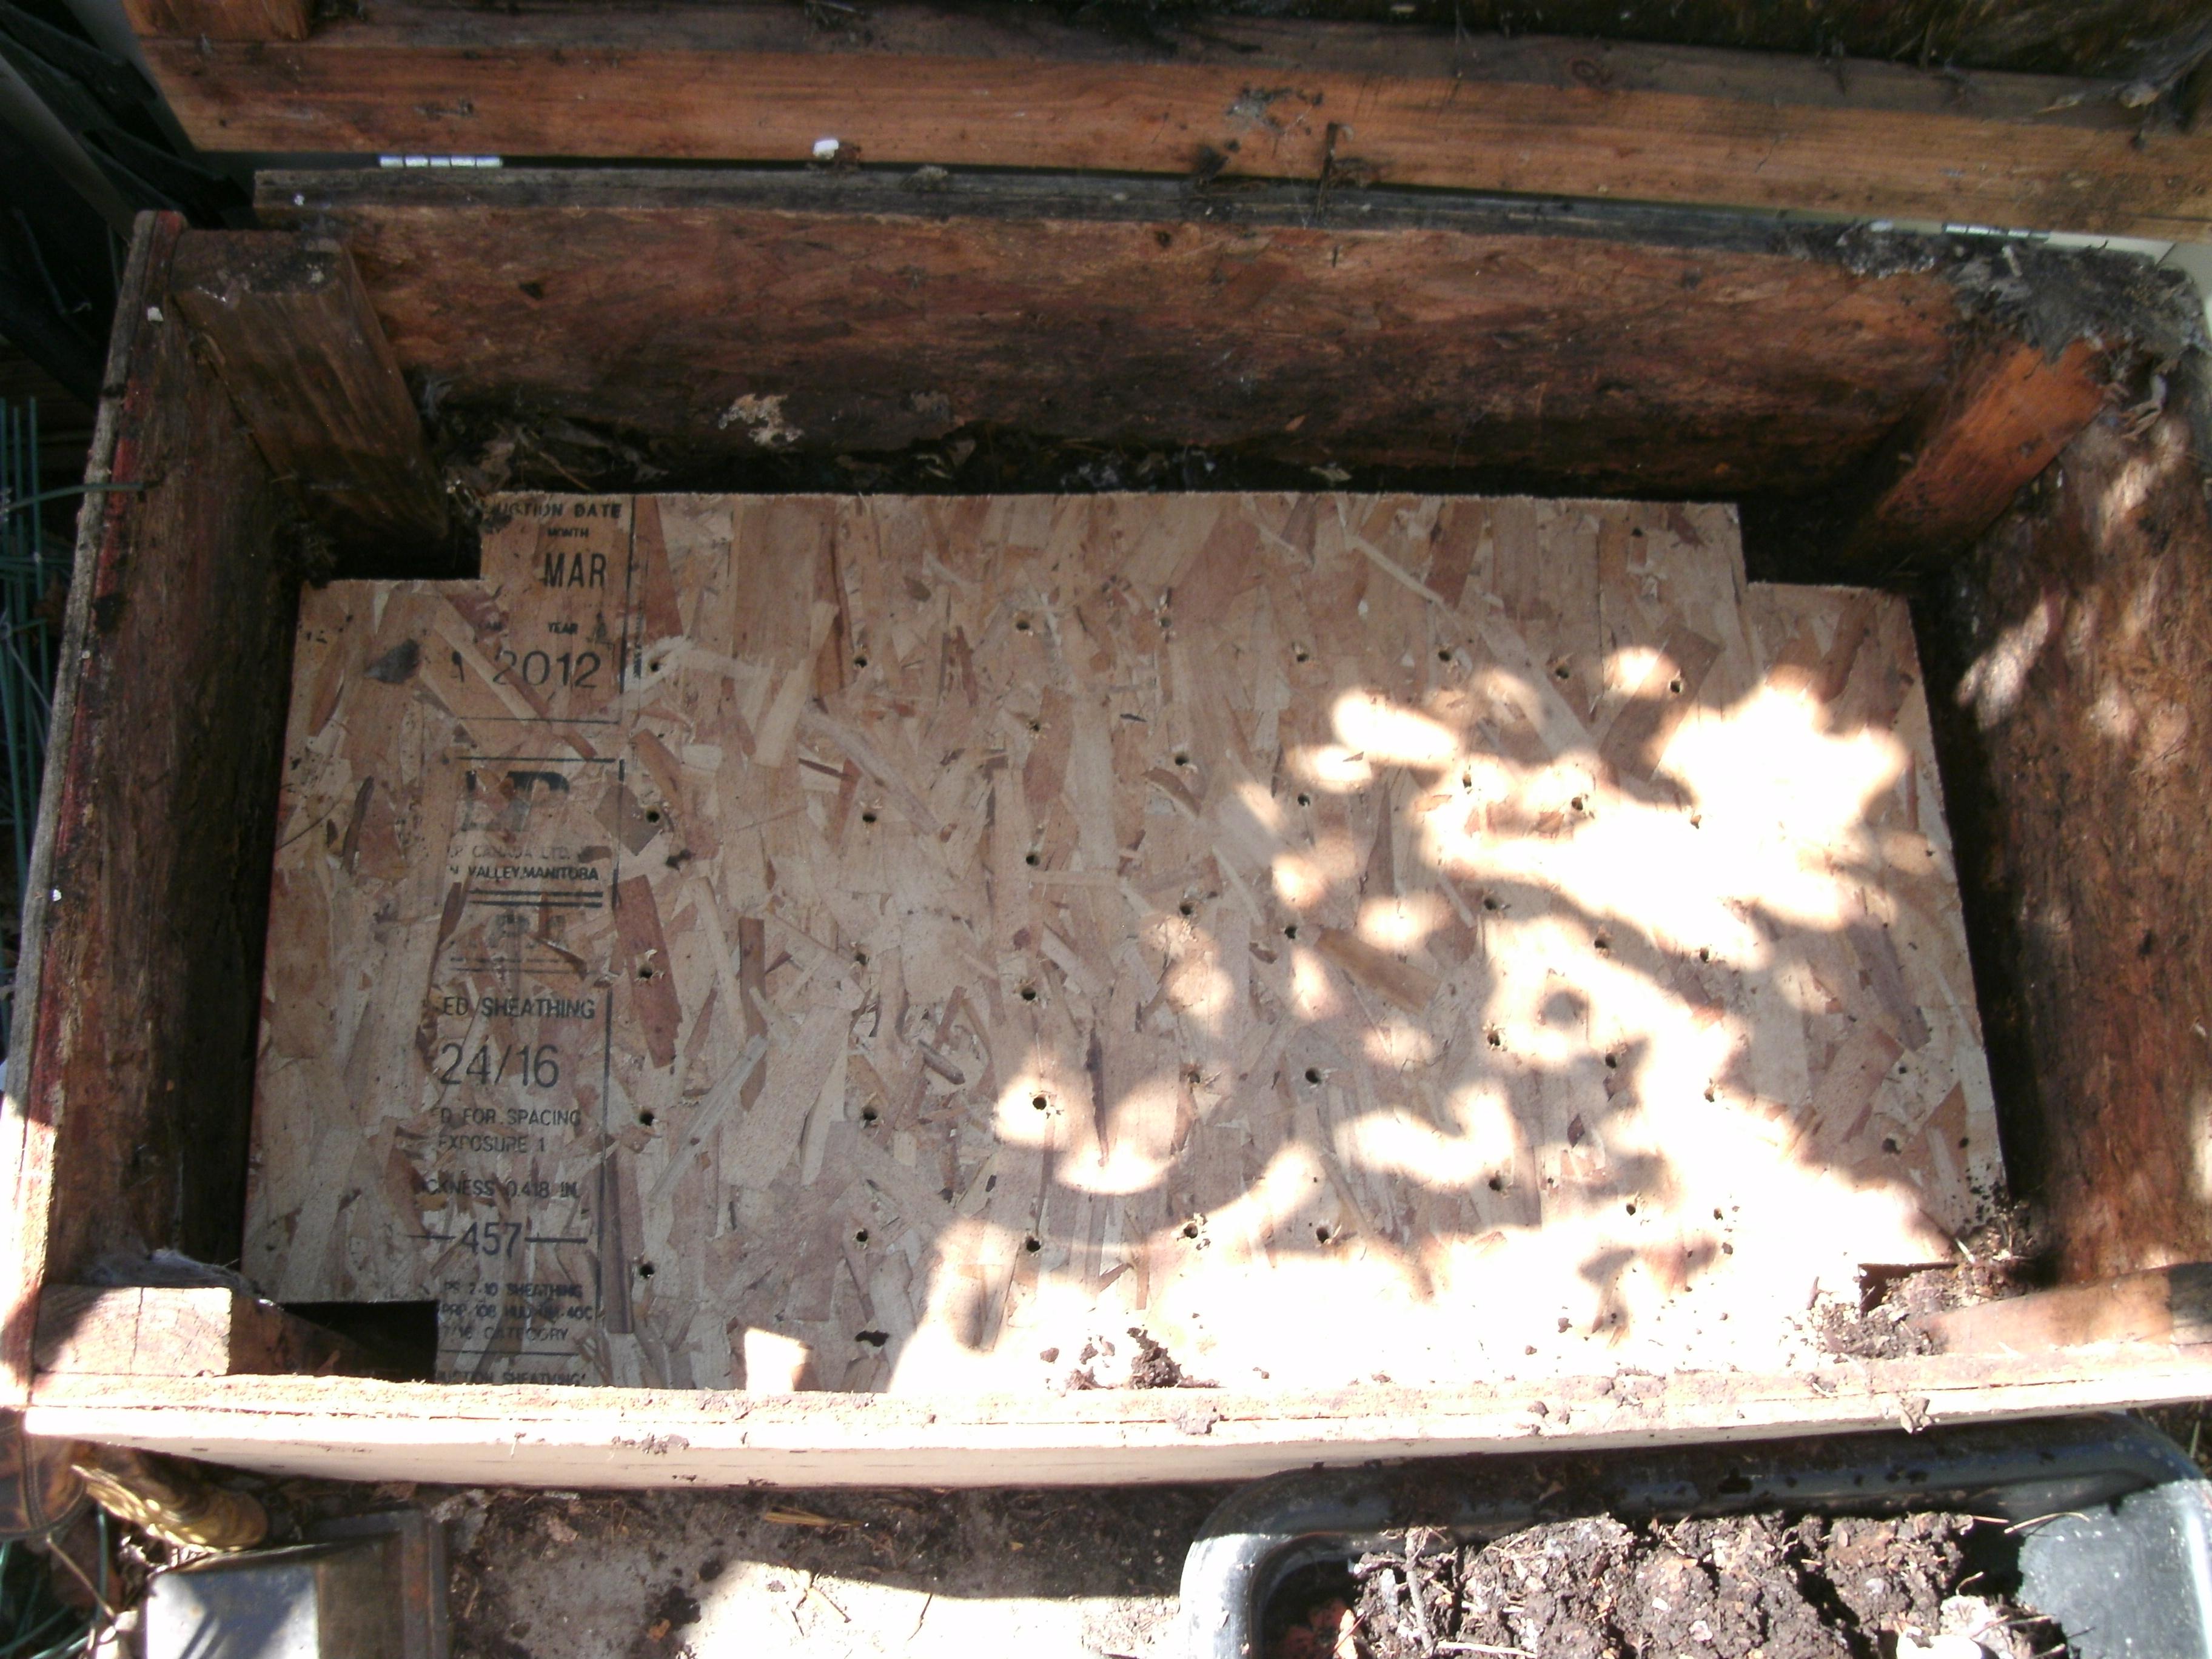 Worm compost bin repair | urbancompostsystems